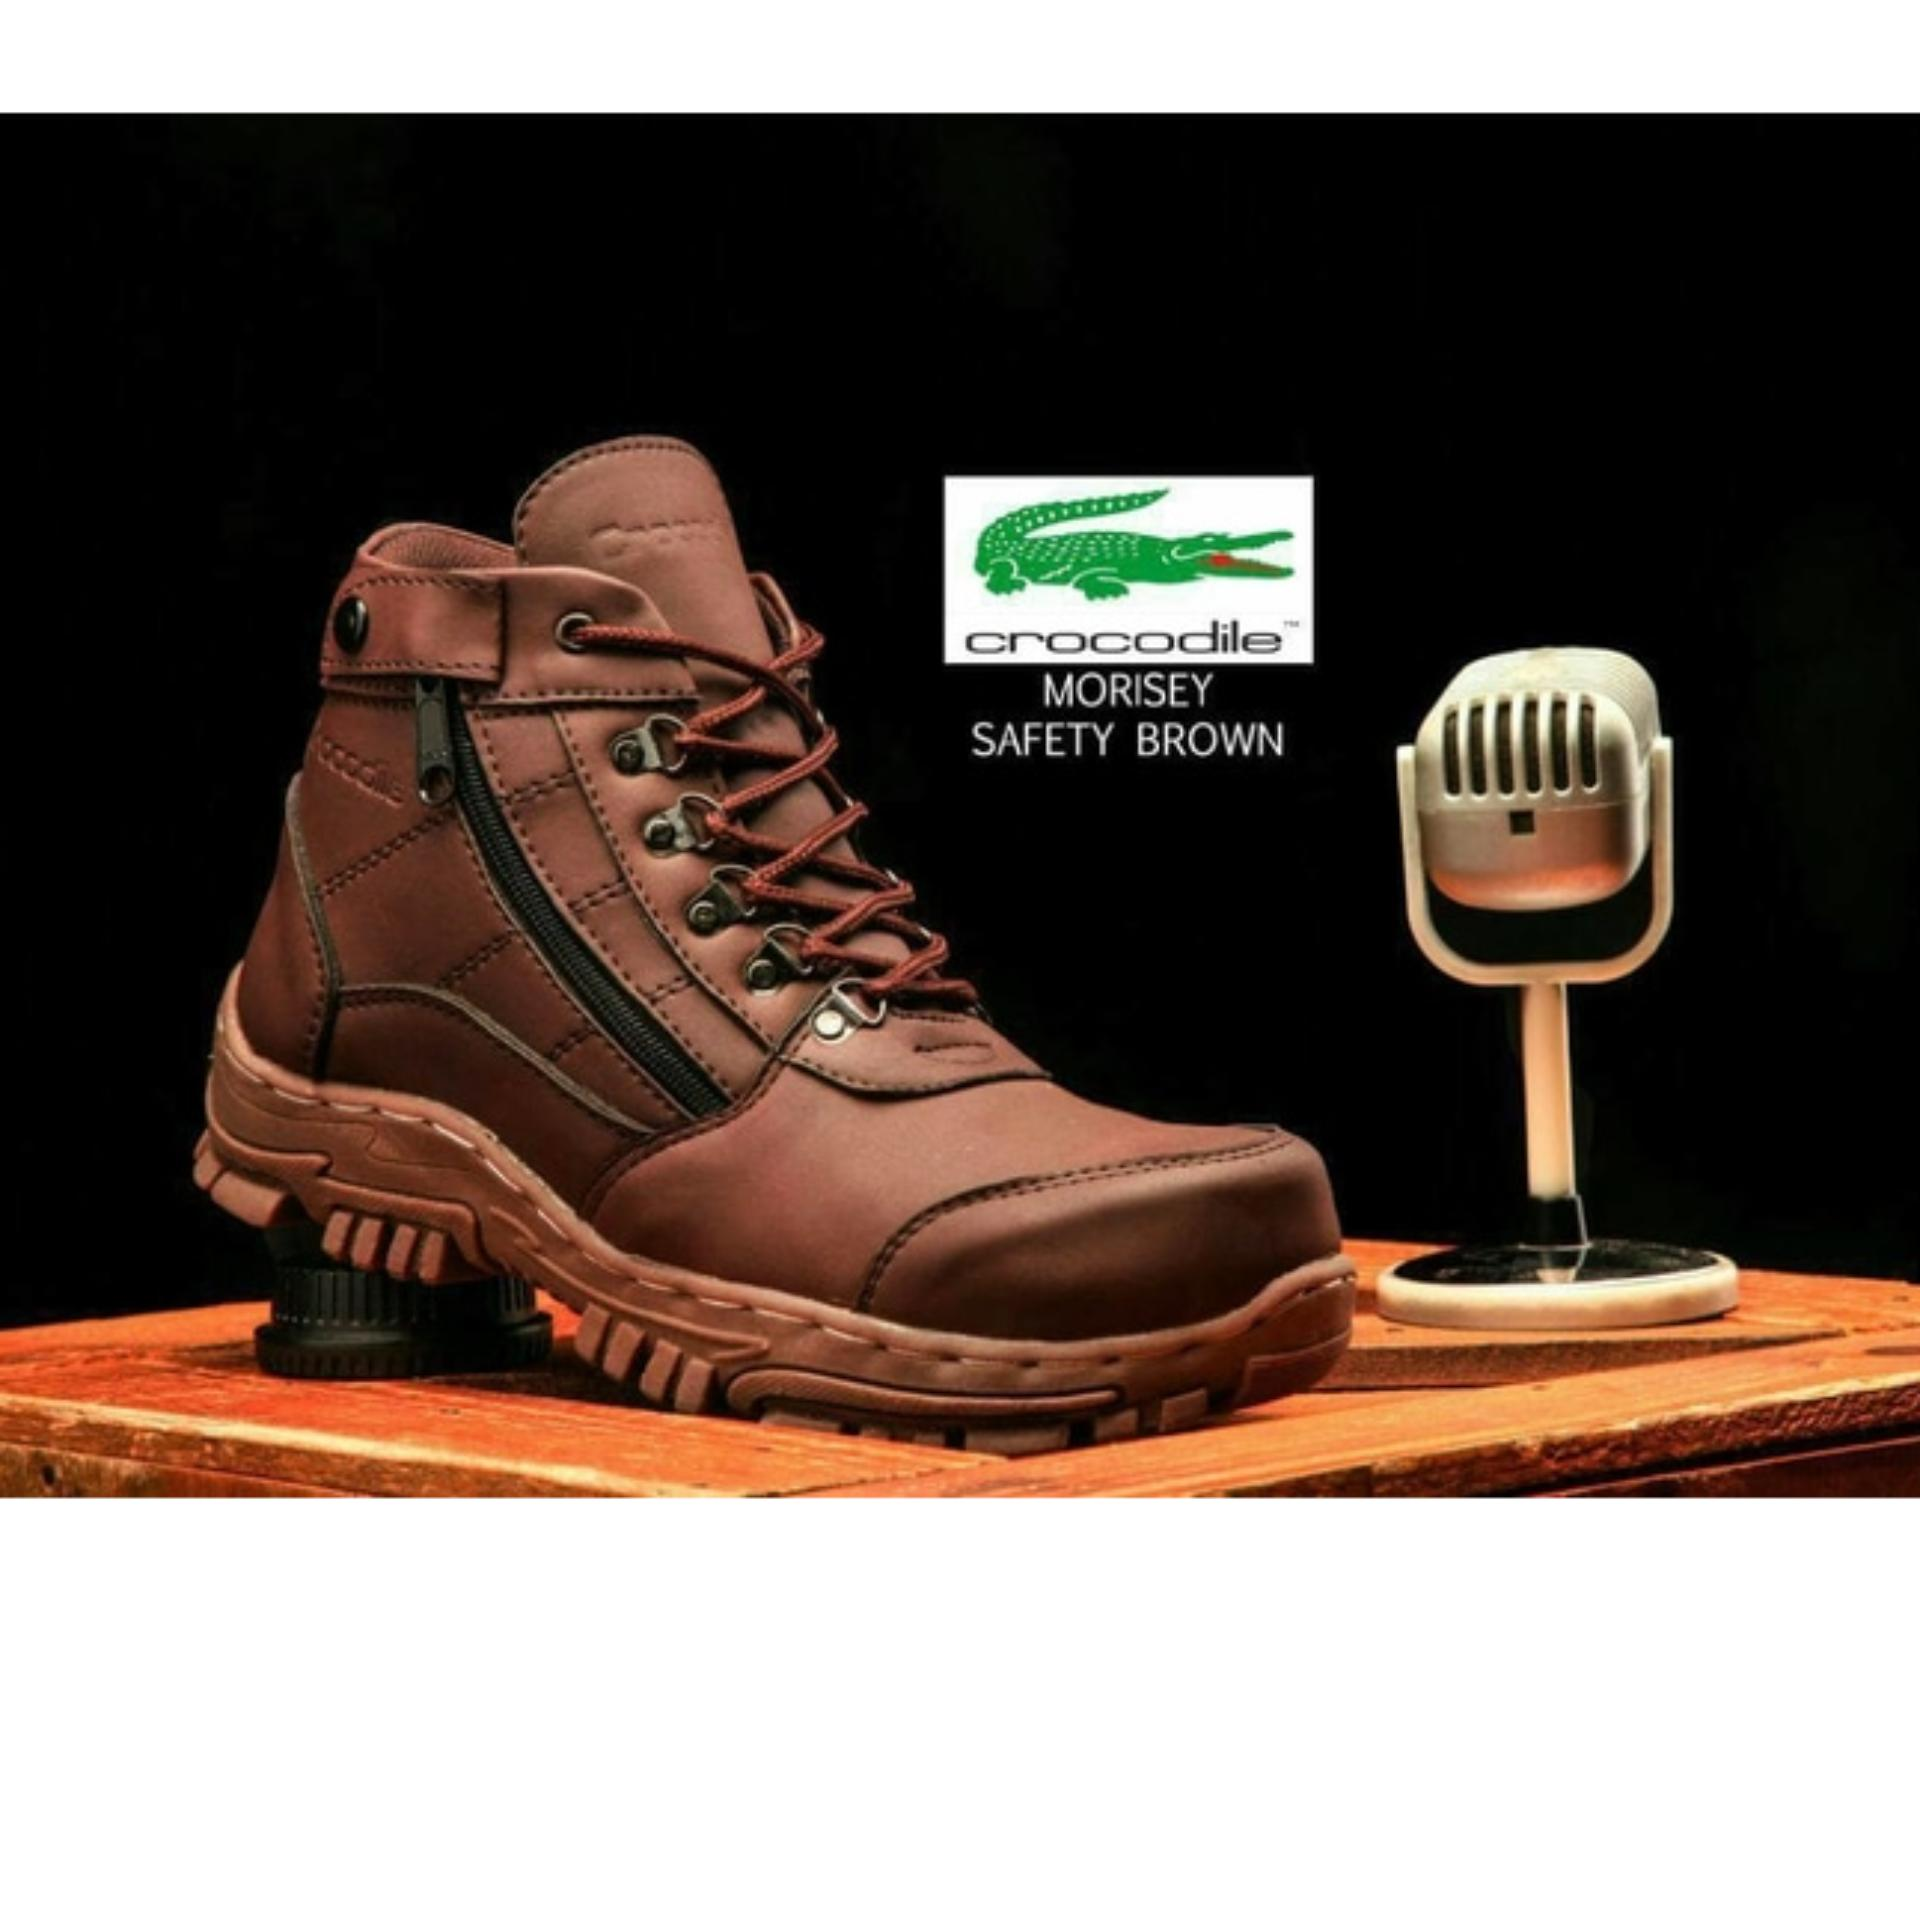 FREE KAOS KAKI 1 PASANG sepatu boots pria crocodile morisey safety boot  murah Crocodile a0ce4c5802